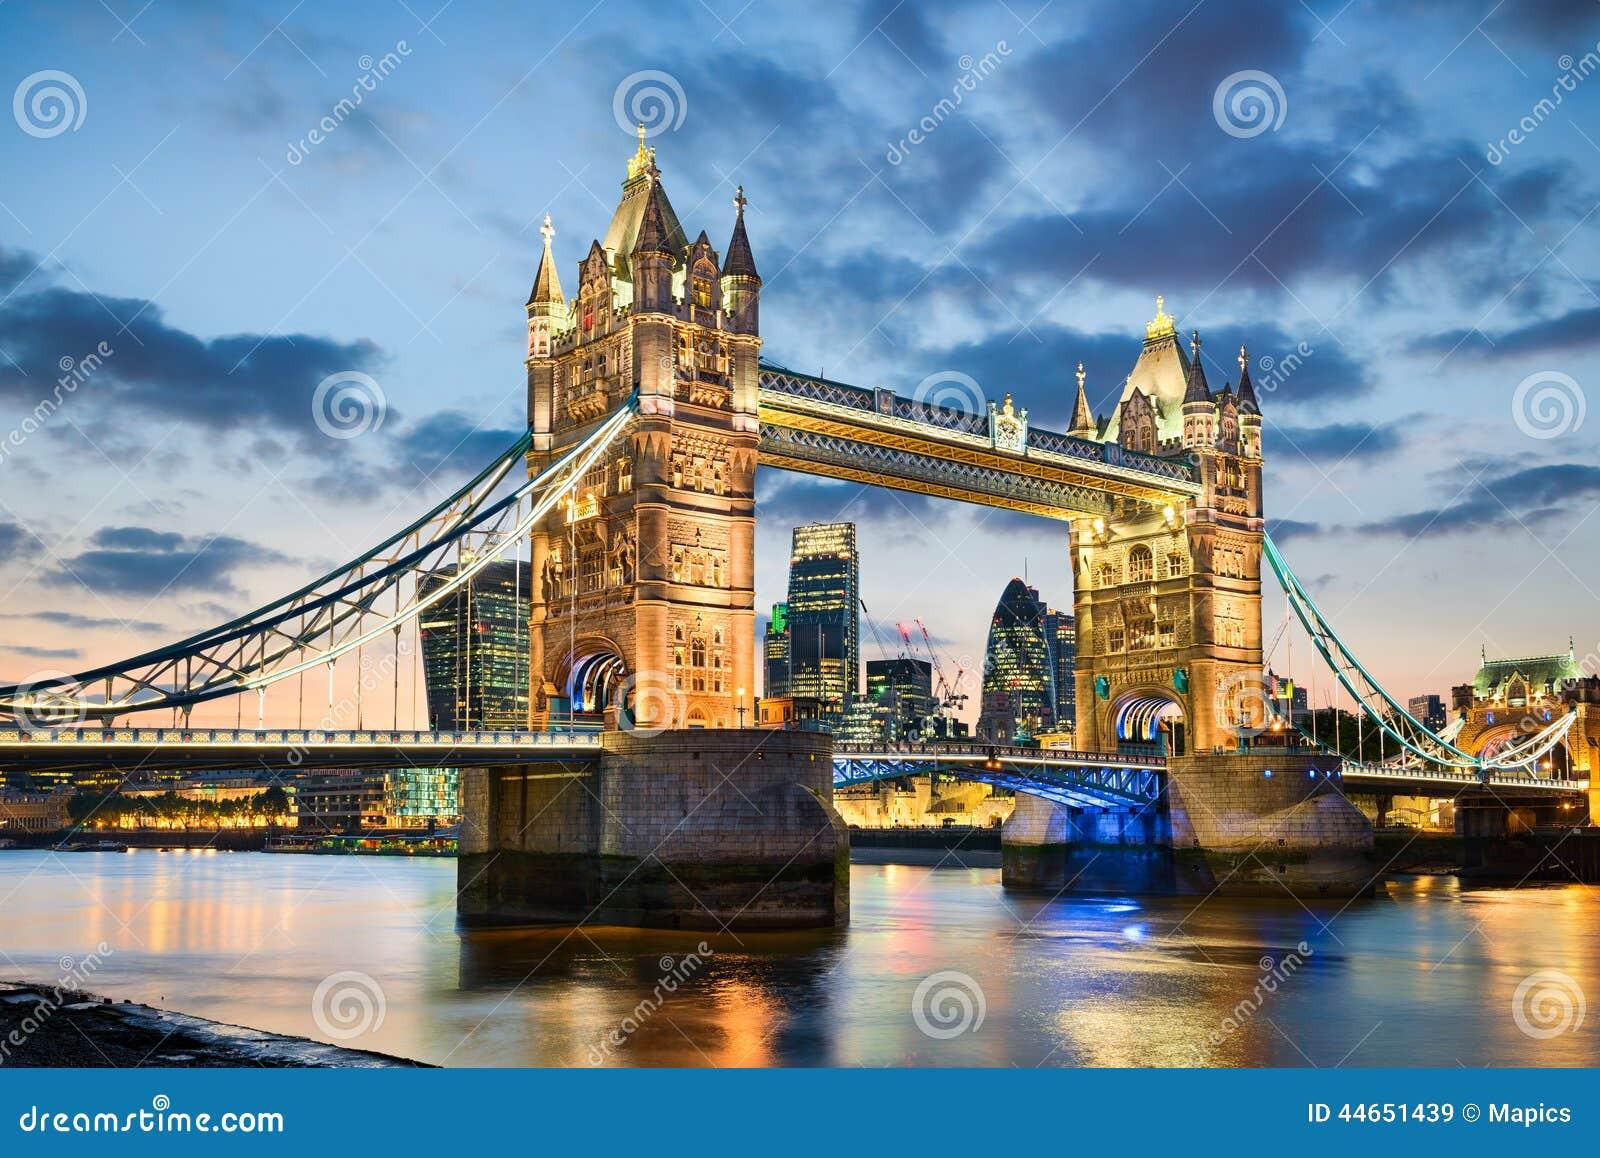 Turm-Brücke, London